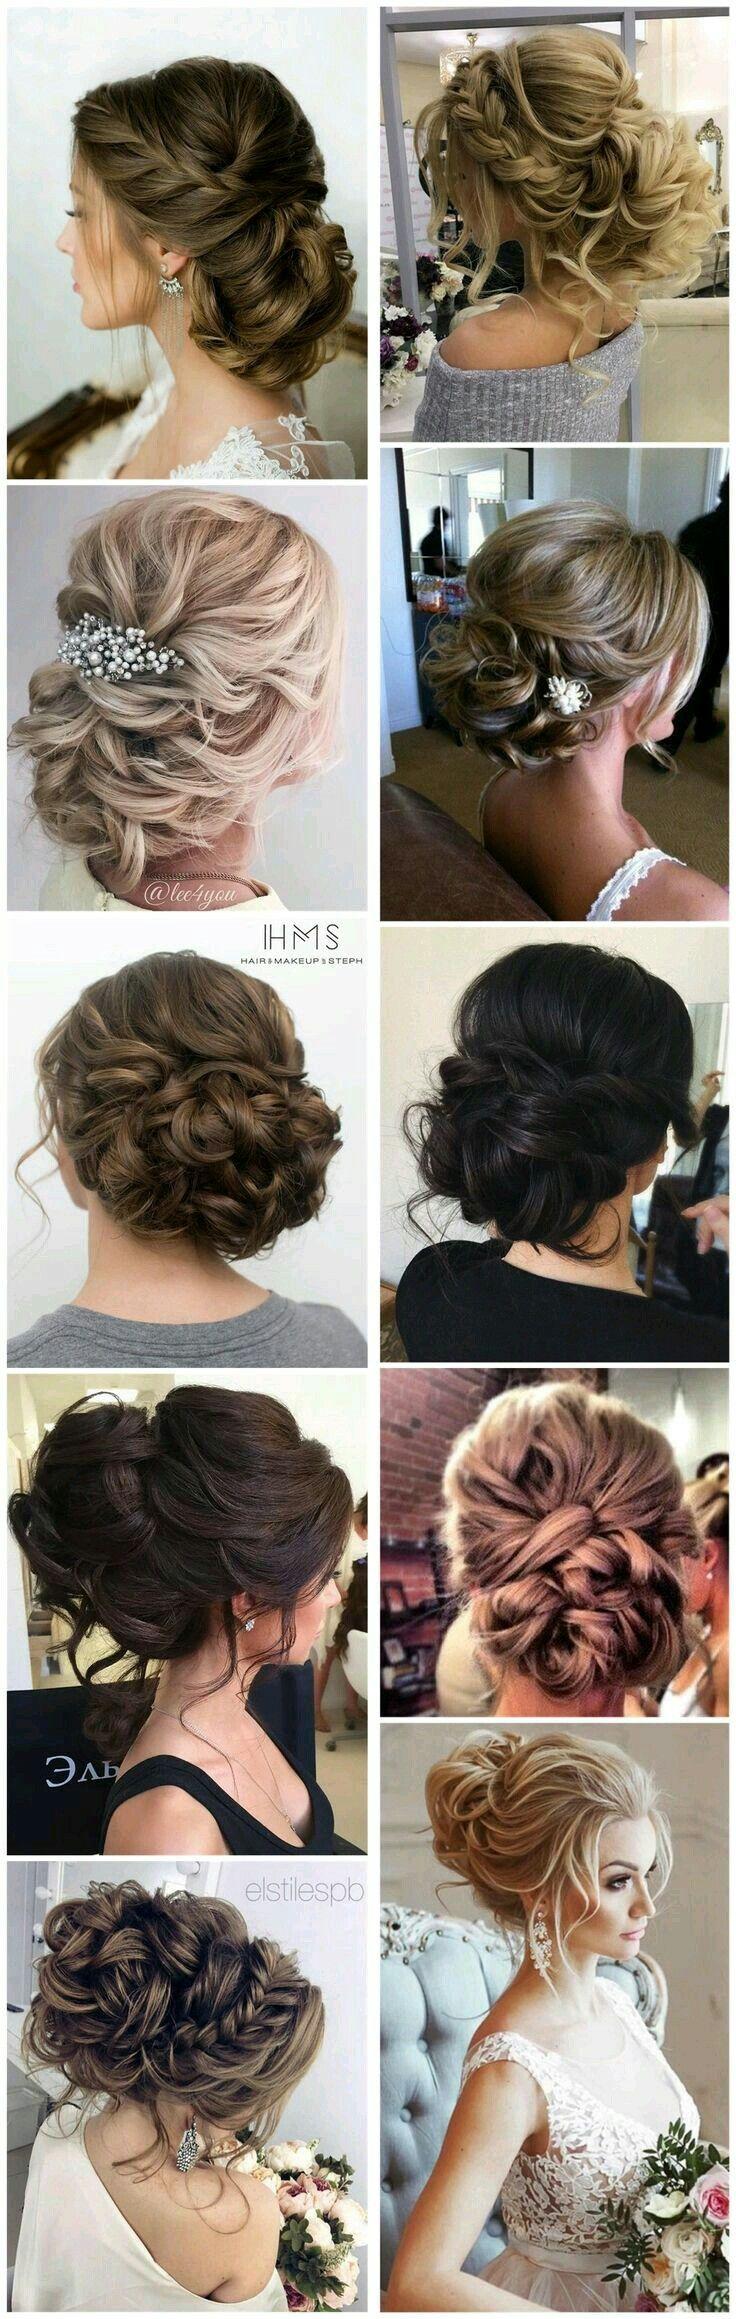 romantic updo. hairstyles. bridal hair.